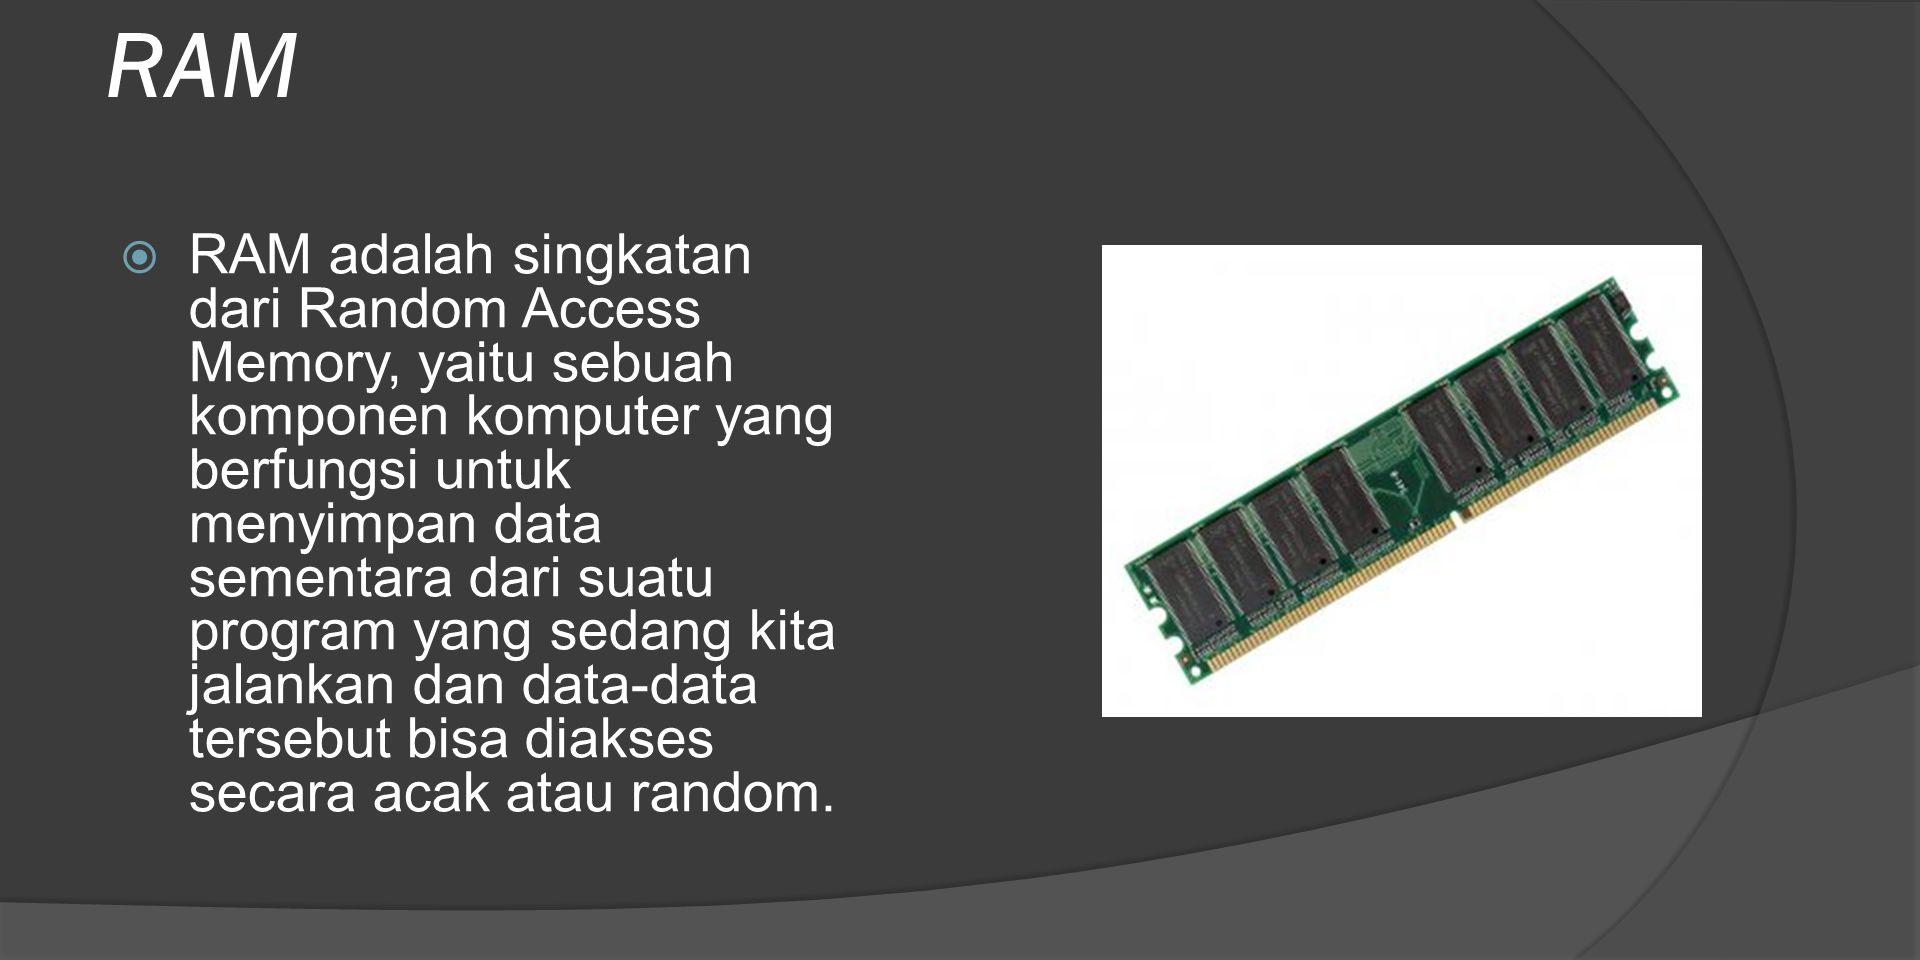 RAM  RAM adalah singkatan dari Random Access Memory, yaitu sebuah komponen komputer yang berfungsi untuk menyimpan data sementara dari suatu program yang sedang kita jalankan dan data-data tersebut bisa diakses secara acak atau random.